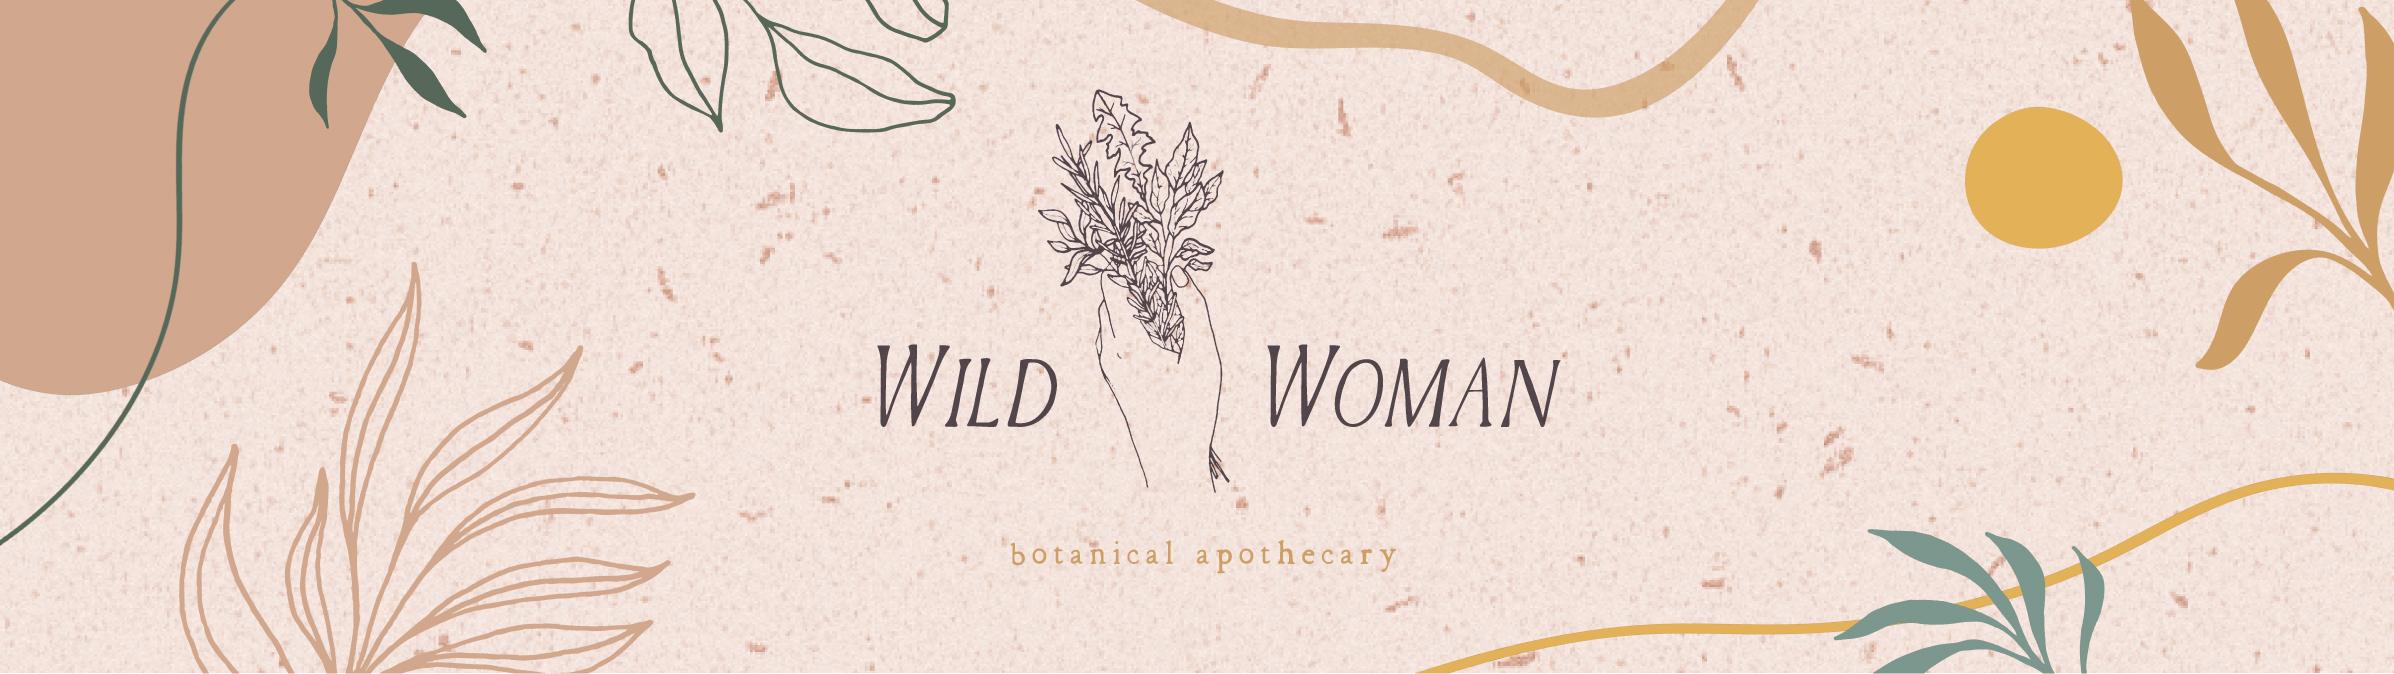 wildwomanbannergraphic.jpg